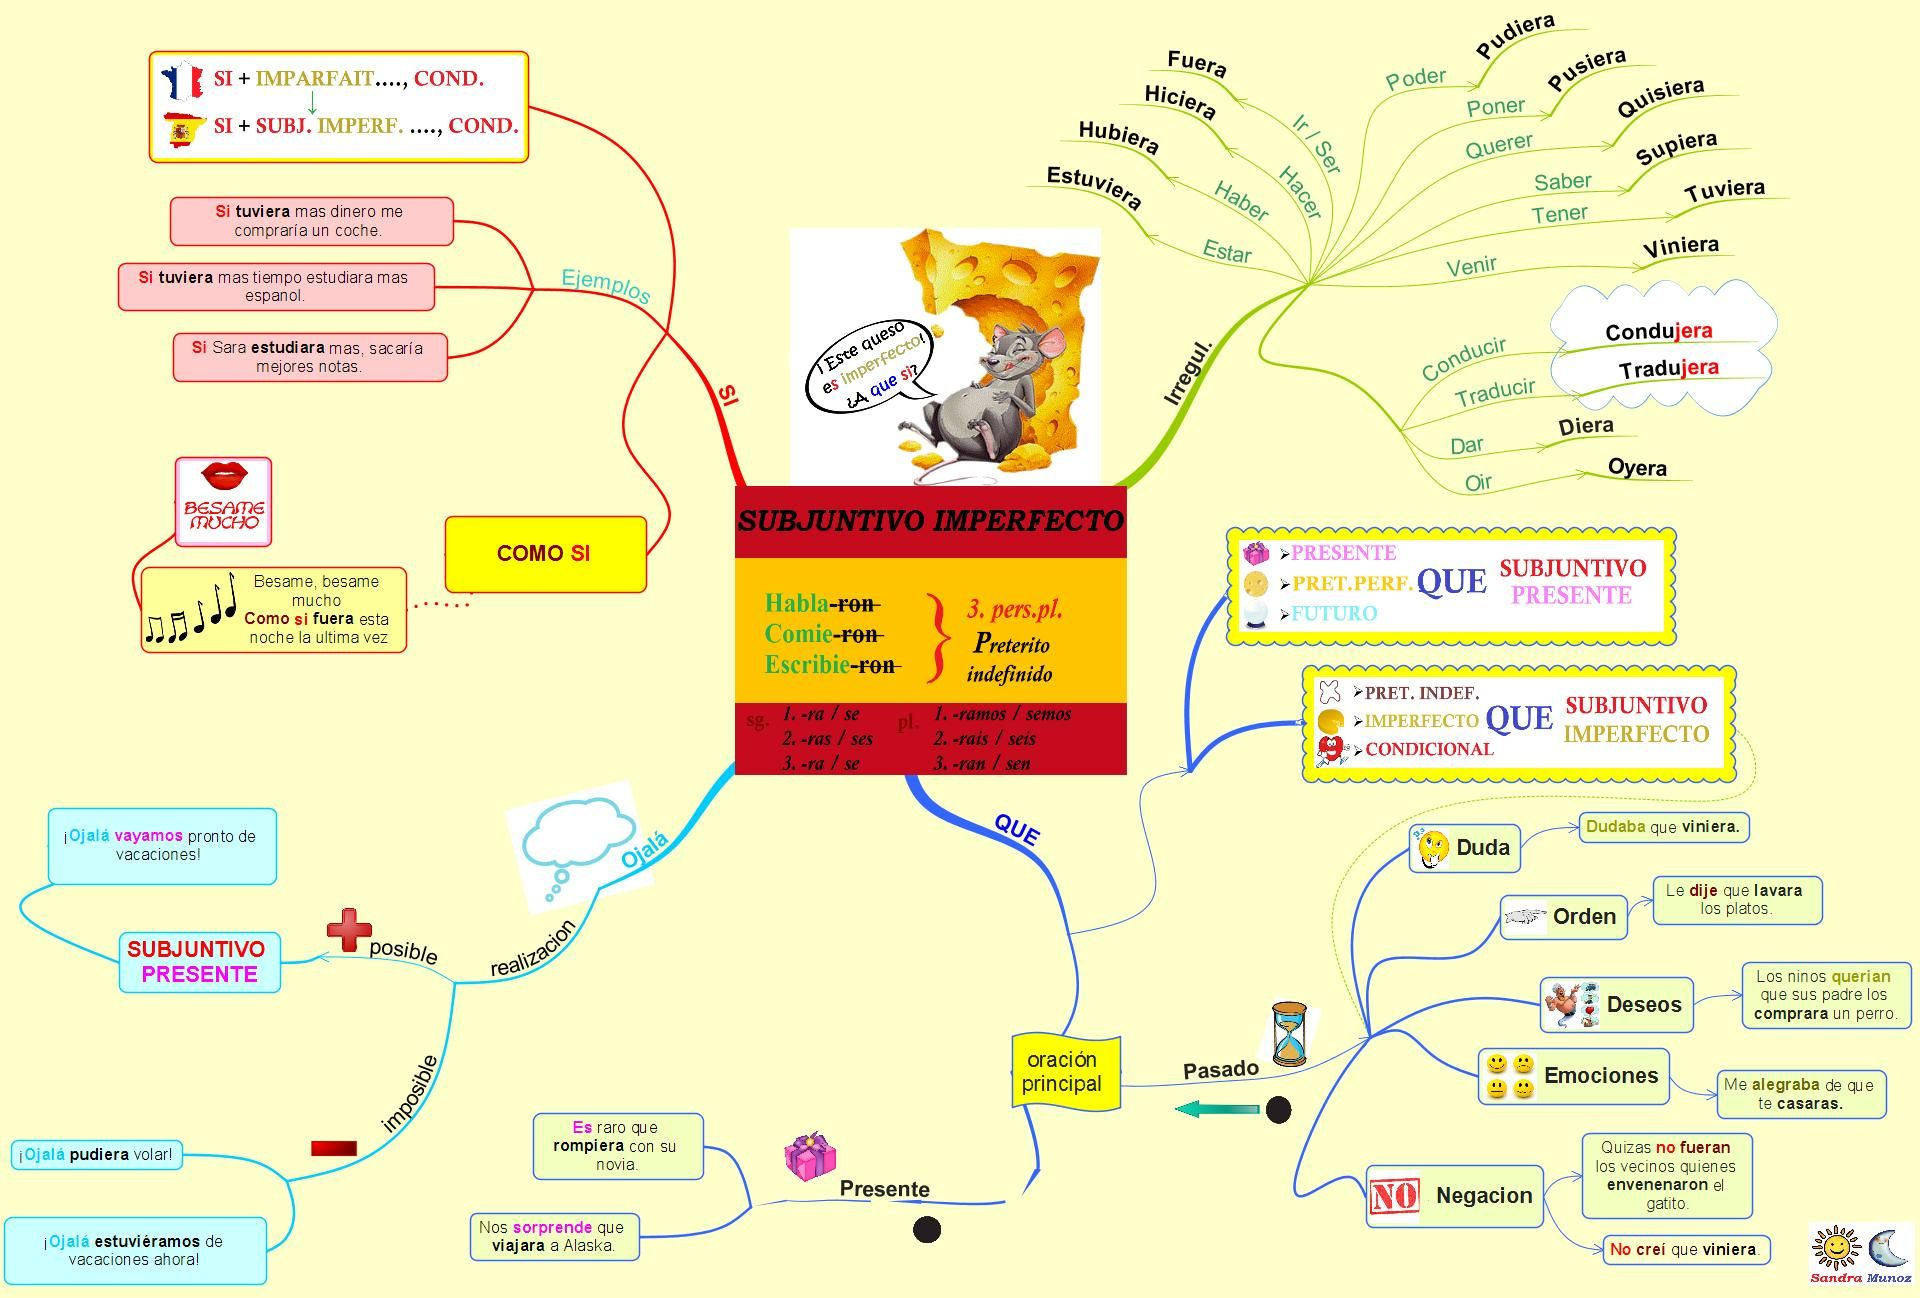 Subjonctif Imparfait En Espagnol Carte Mentale Grammaire Espagnole Espagnol